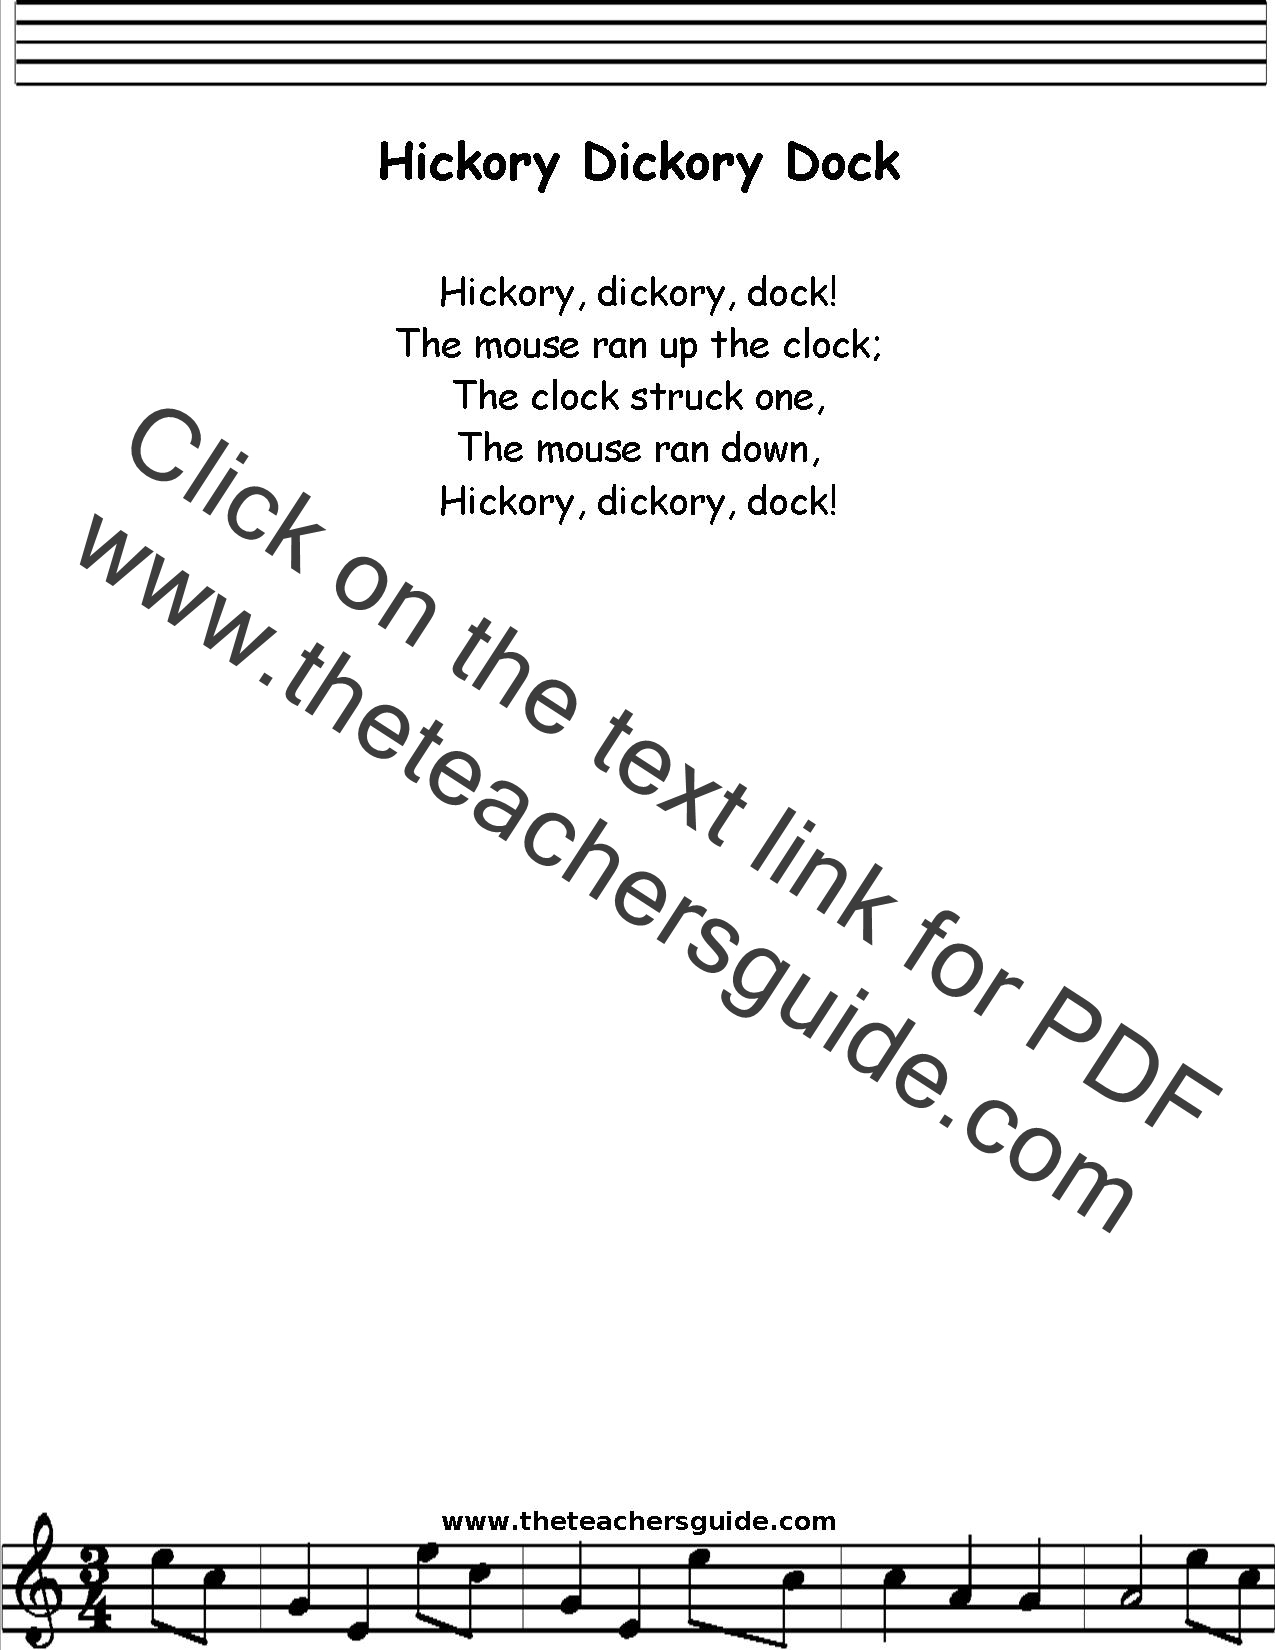 Hickory Dickory Dock Lyrics, Printout, MIDI, and Video